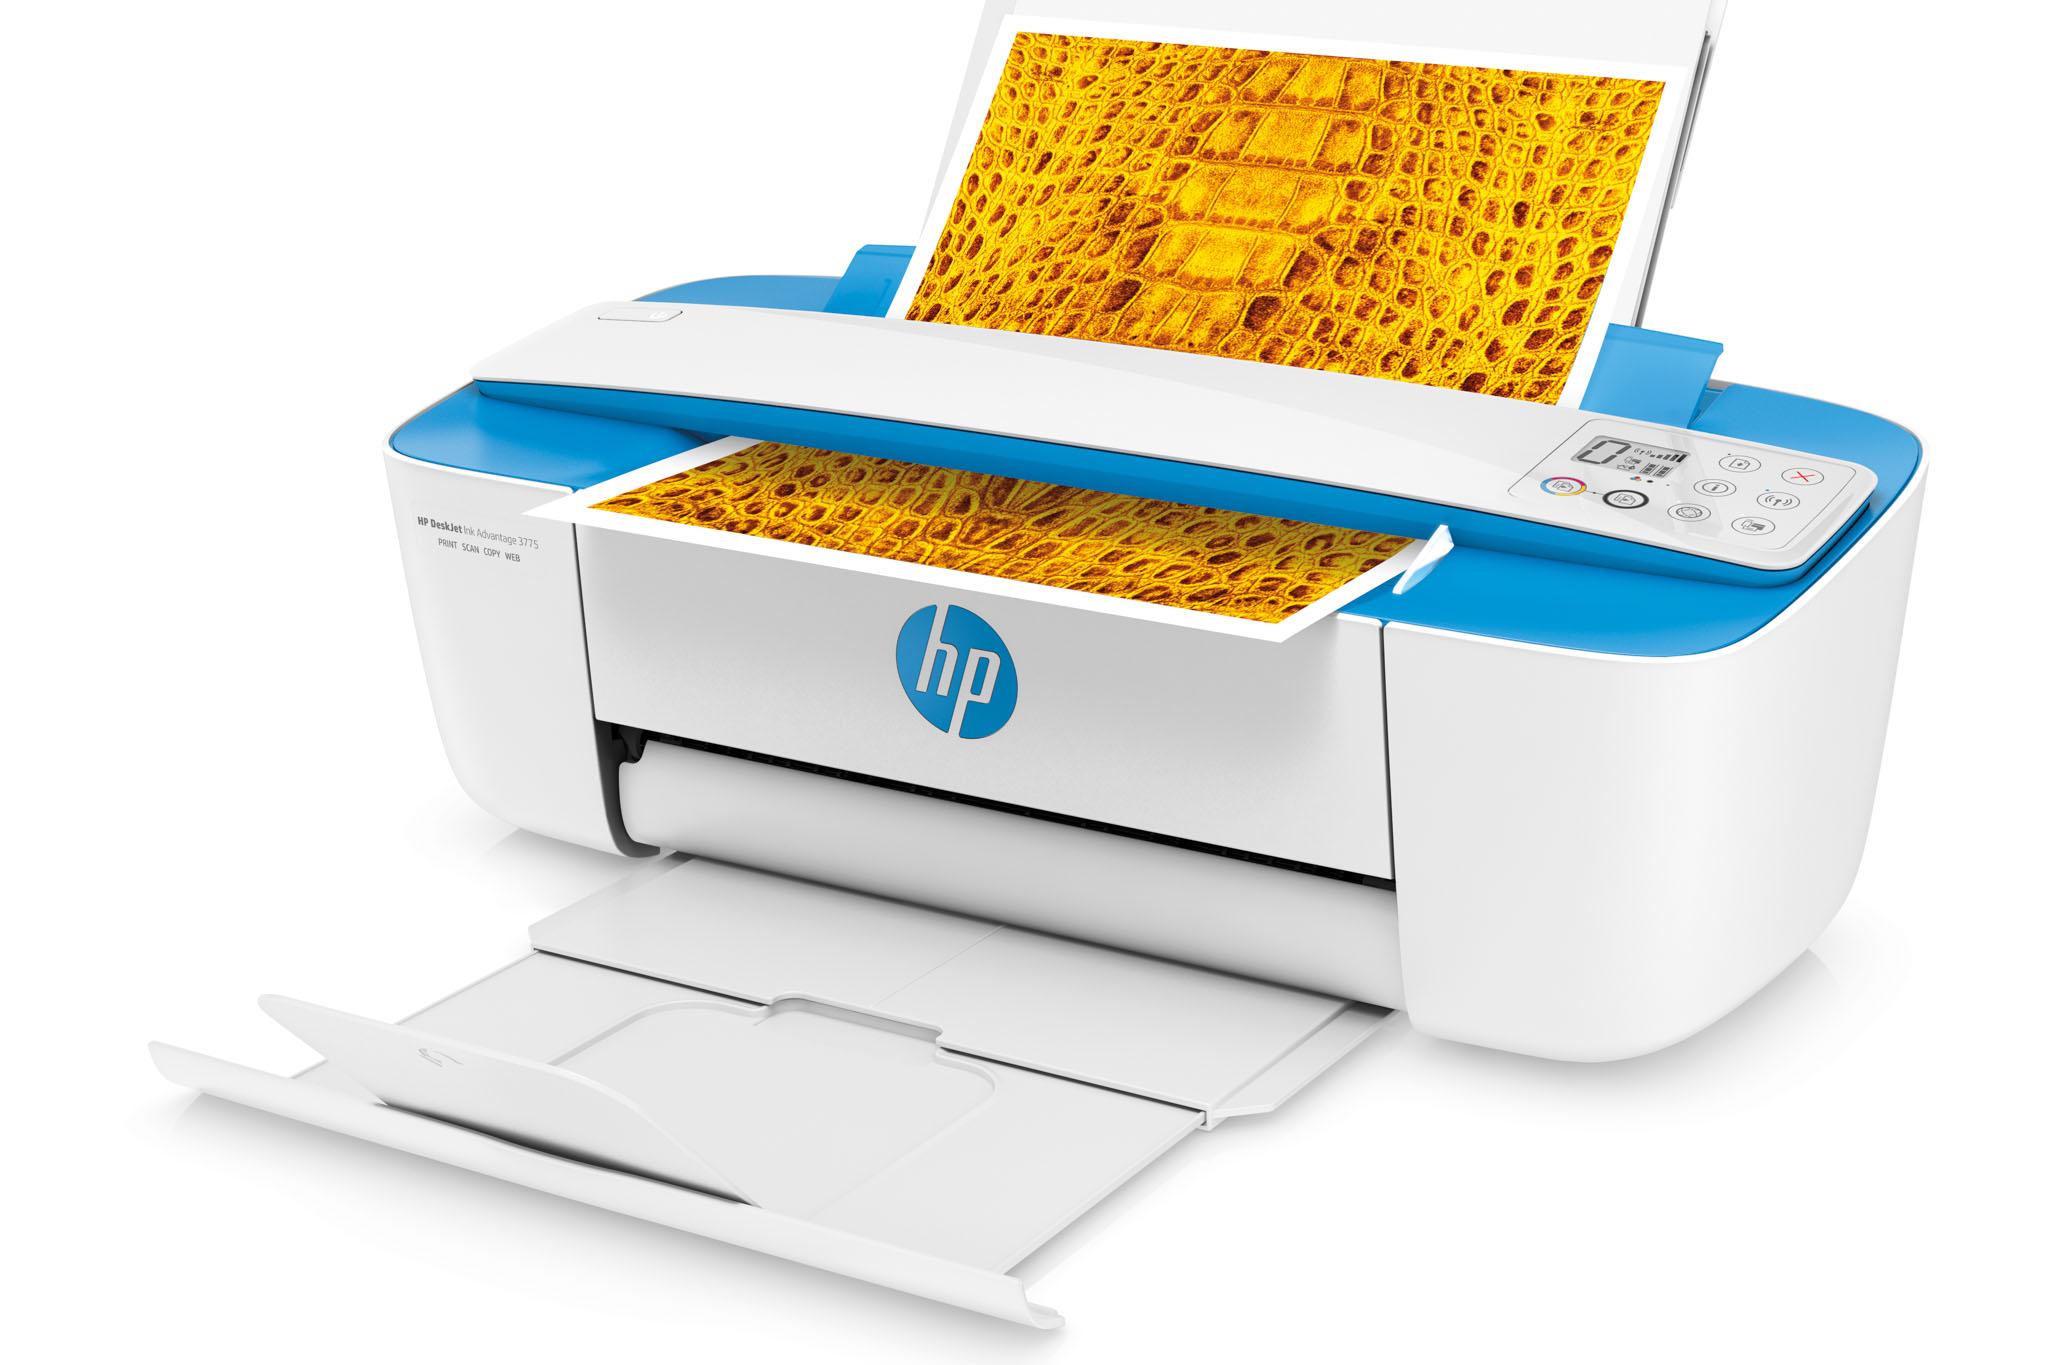 HP DeskJet_tinhte.vn 2.jpg